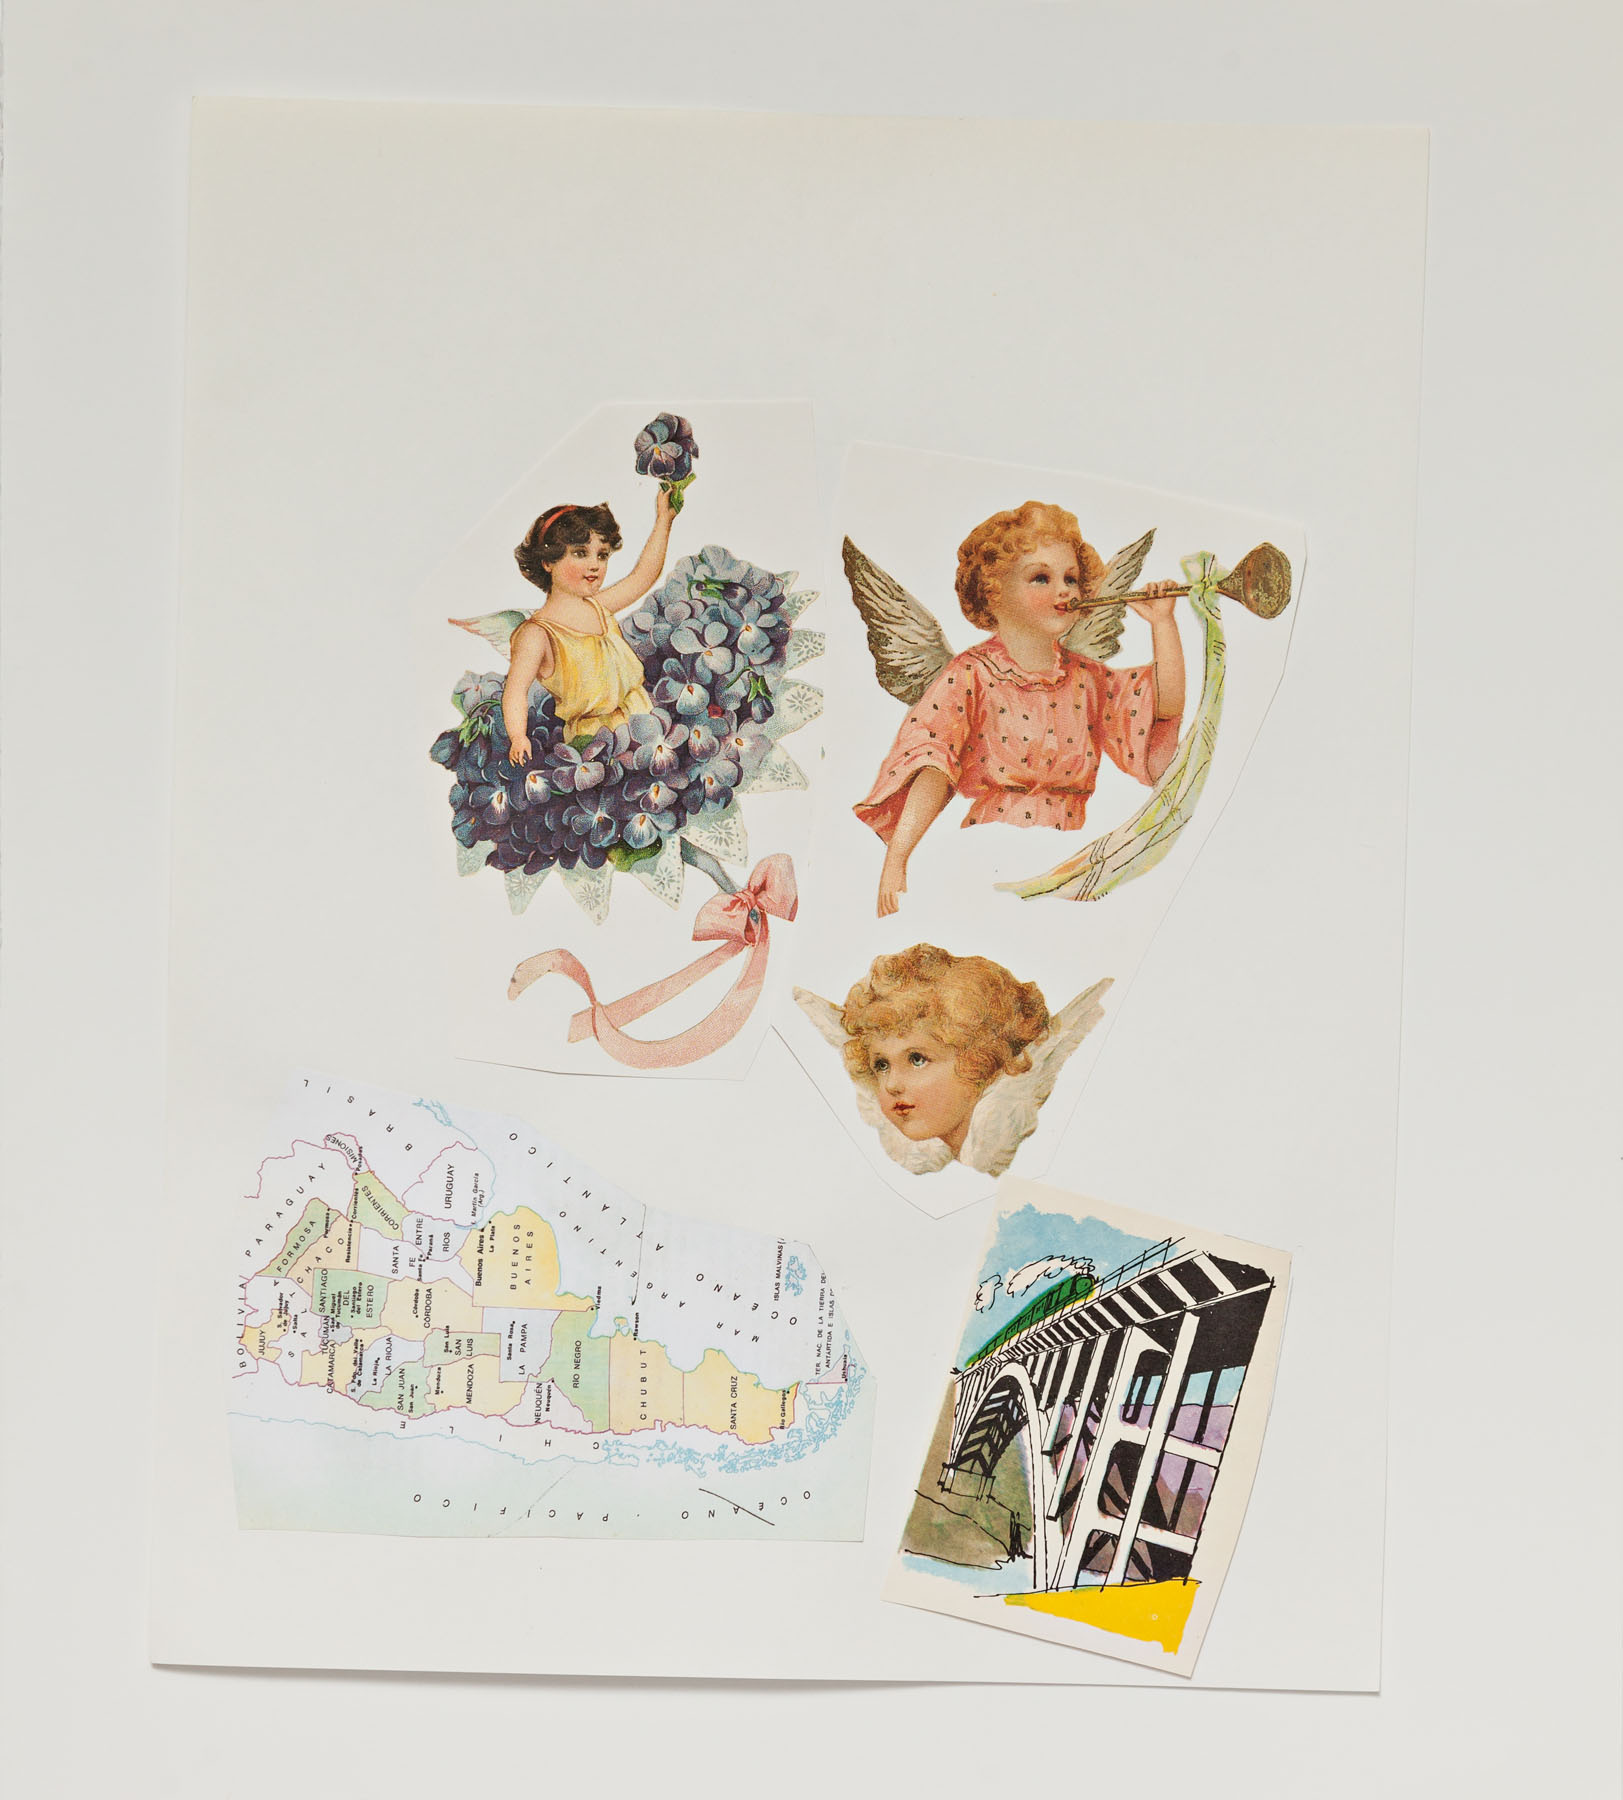 Serie Cuarentena, papel collage, 32,5 cm x 29 cm, 2020